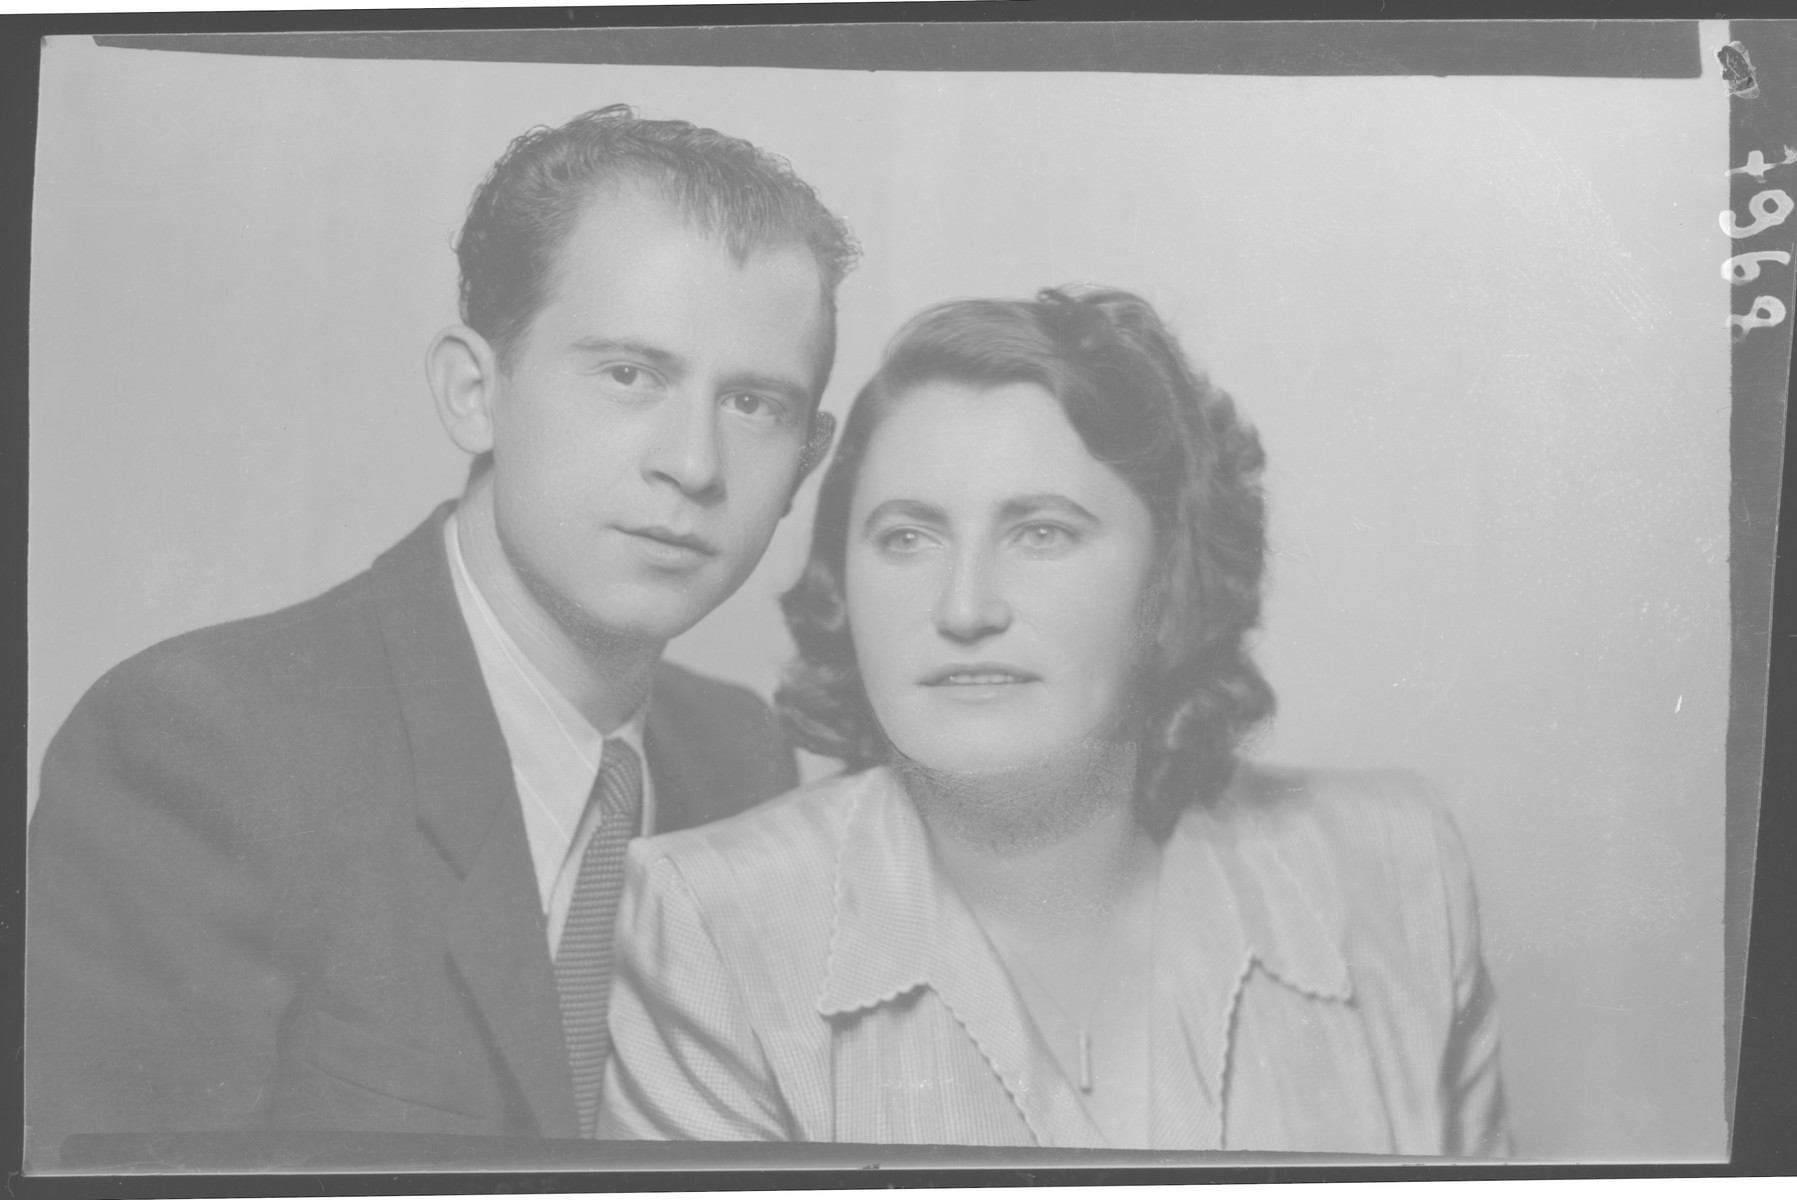 Studio portrait of Kalman Grunberger and his wife.